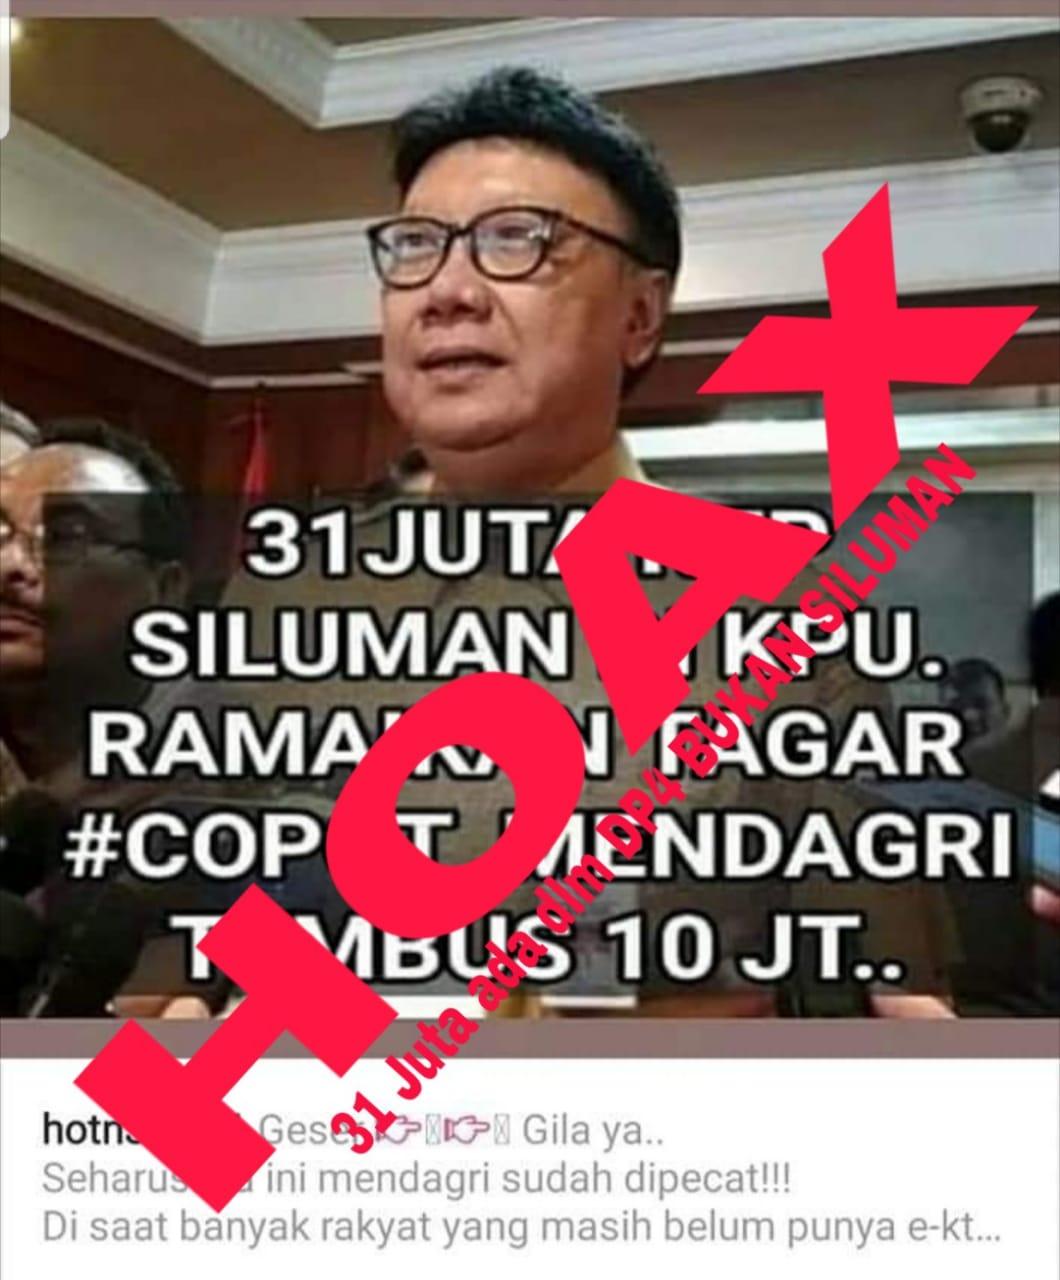 Kemendagri Pastikan Tak Ada DP4 Tambahan yang Dimasukan dalam DPT Pemilu 2019